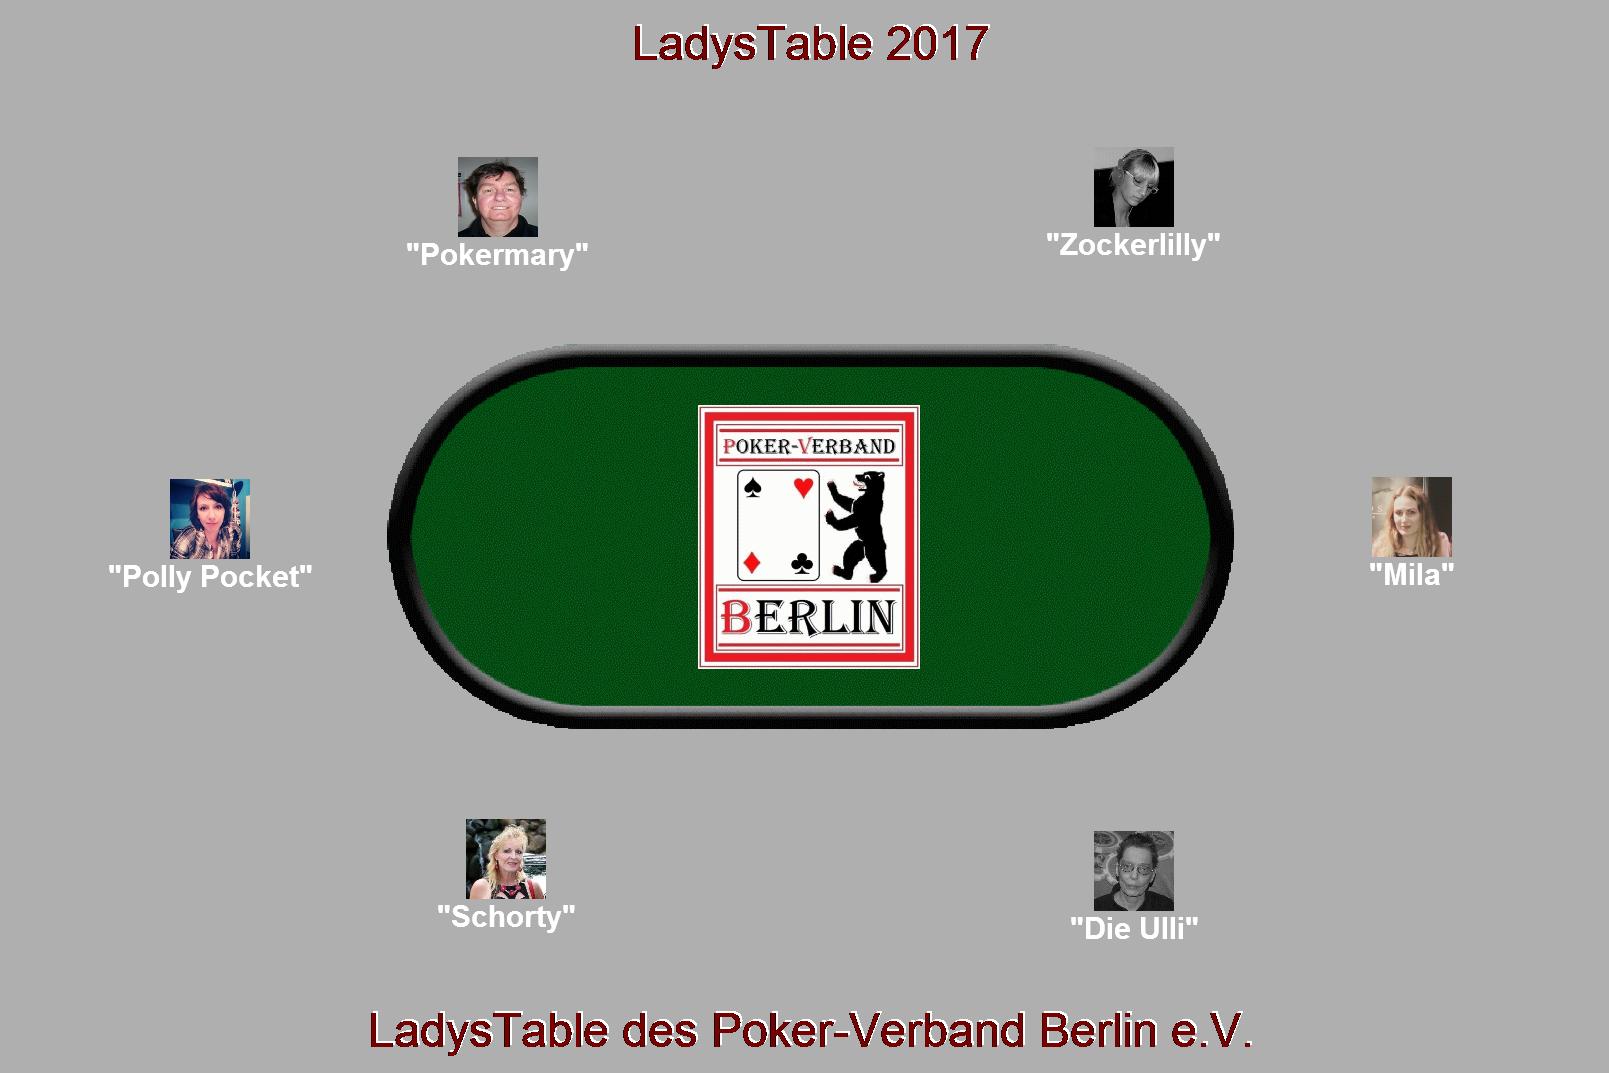 LadysTable 2017 des PVB / Teilnehmer